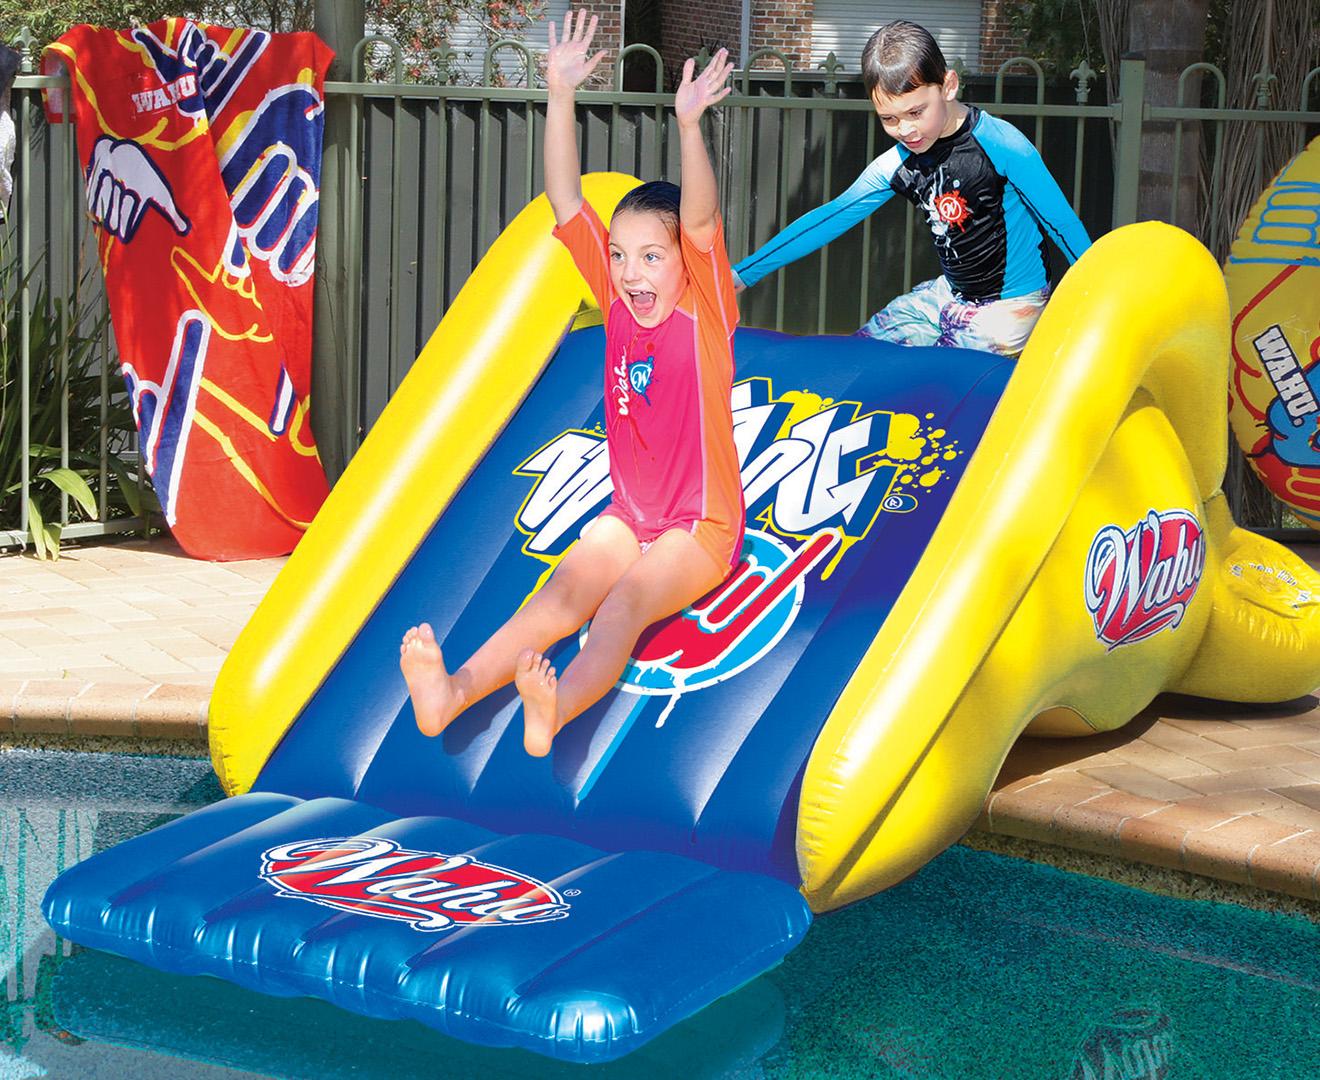 Wahu Pool Party Slide | Catch.com.au